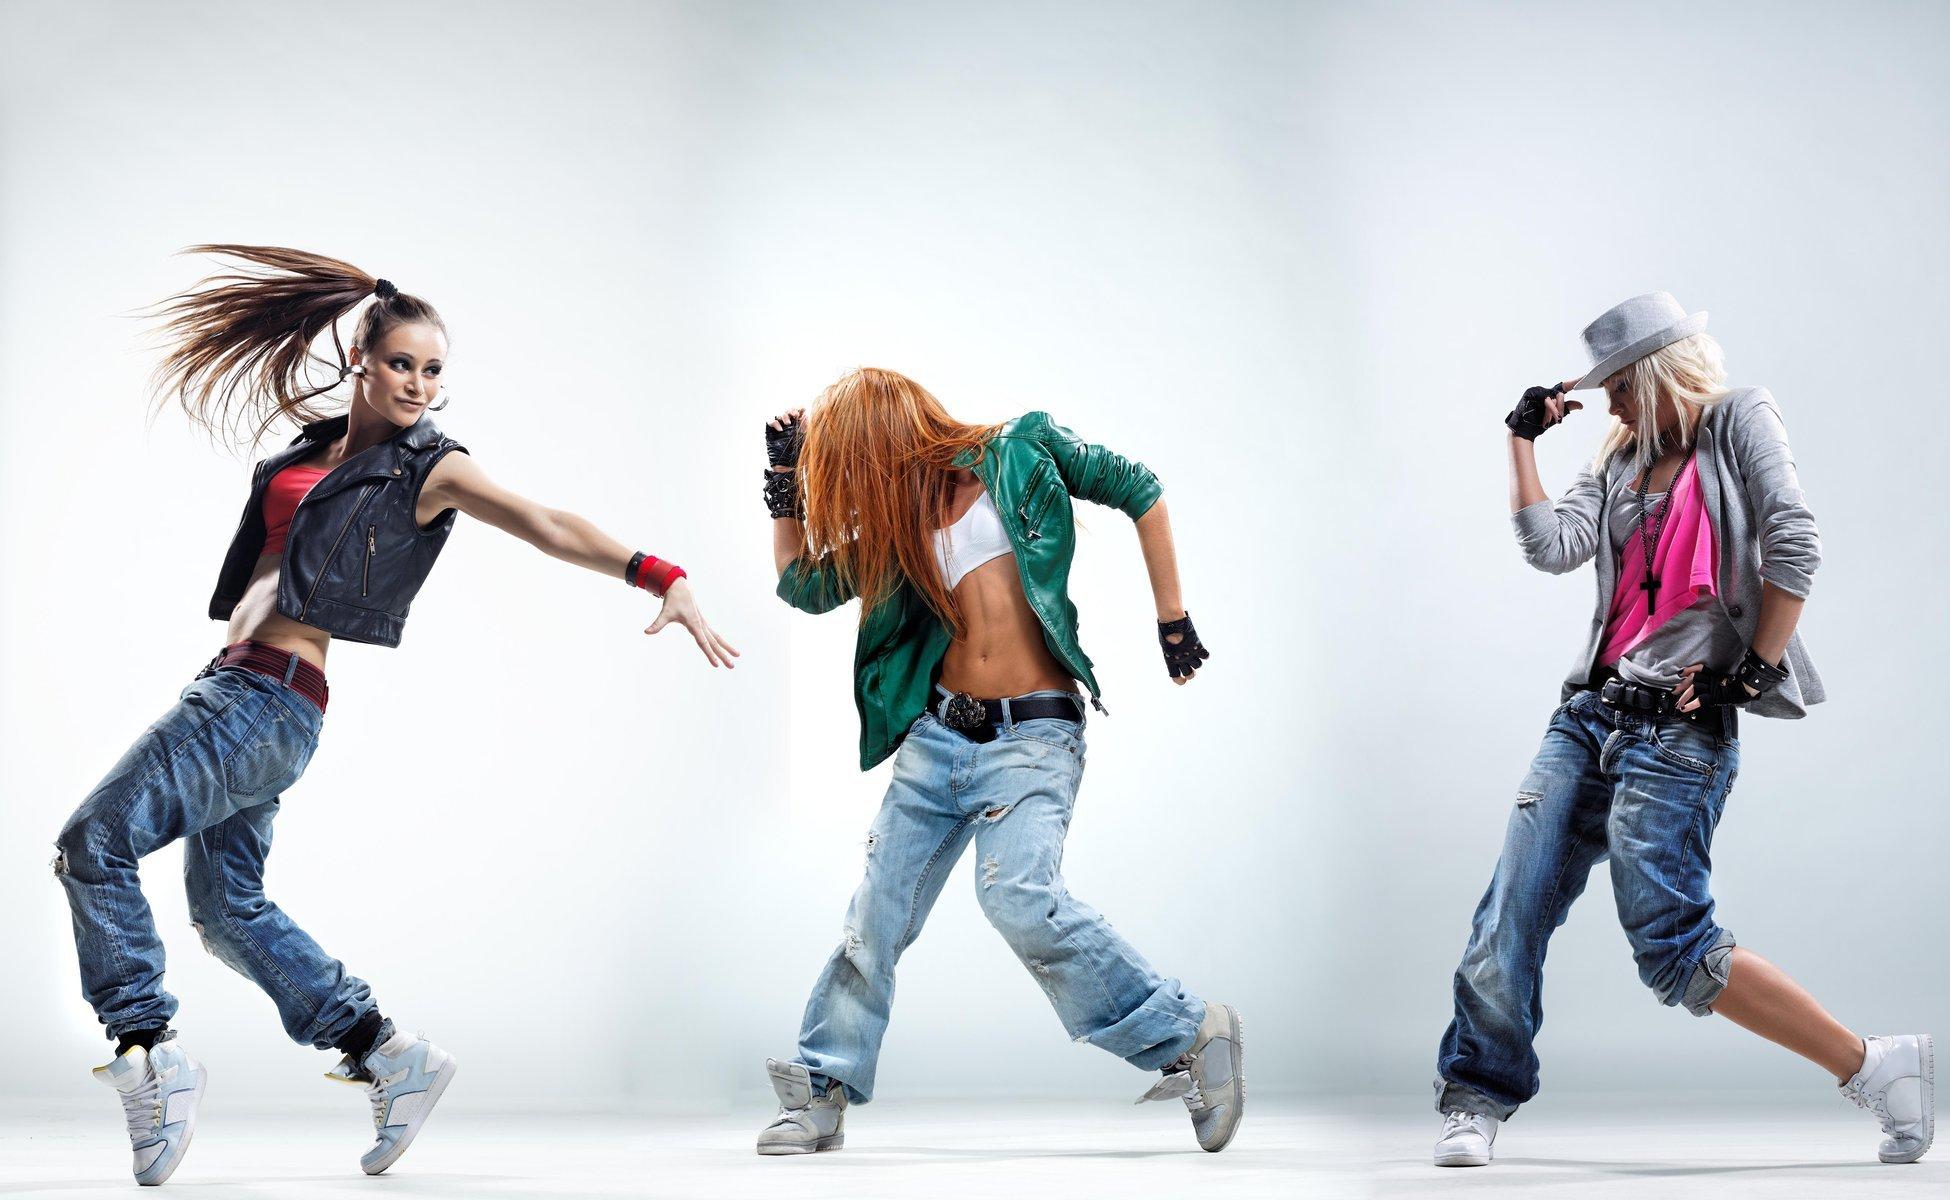 танец танцы танцора хип хоп Rnb девушки танцоры движение позы